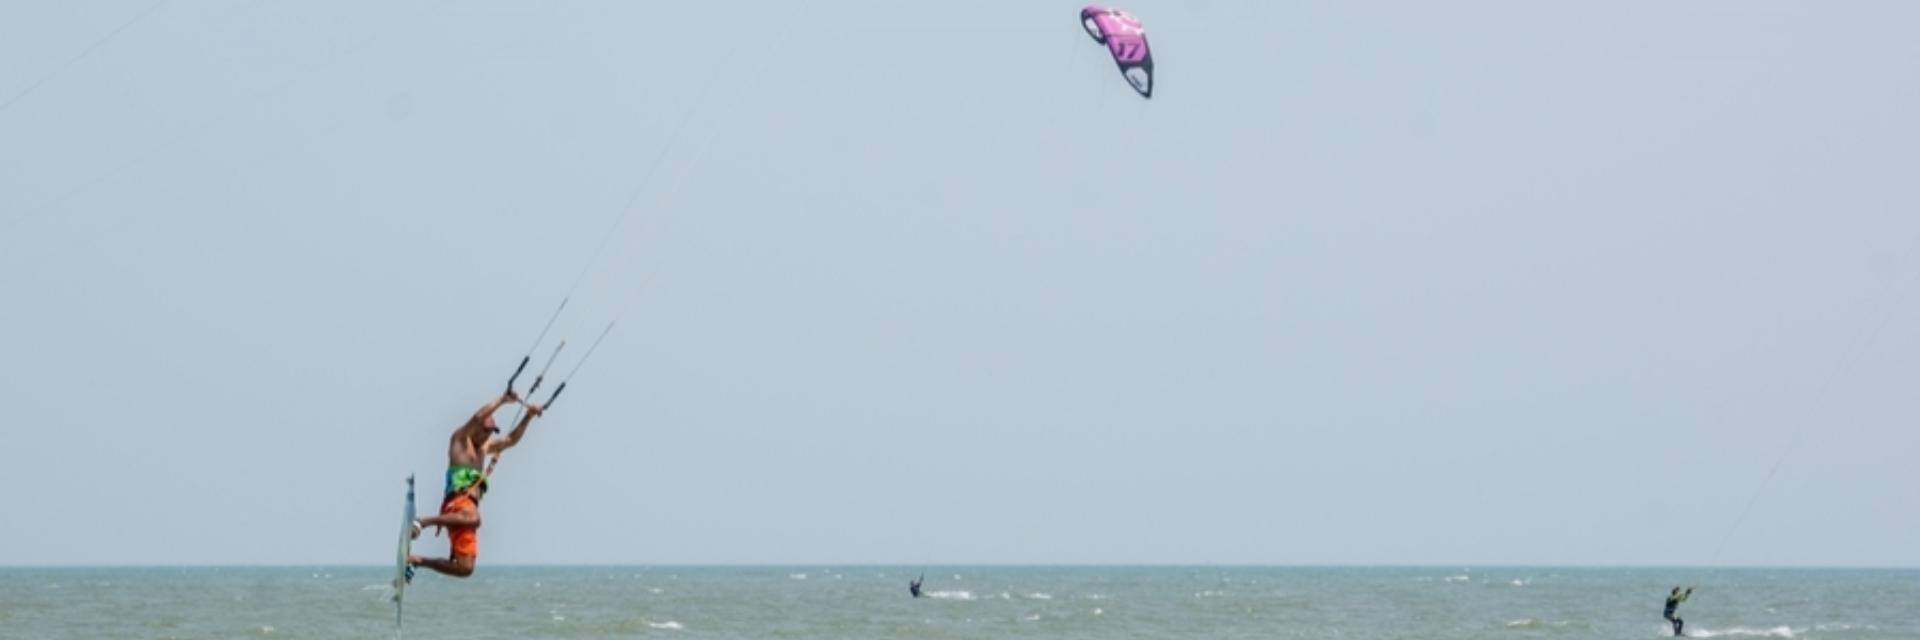 KITEBOARDING IN PRAN BURI: THE EXCITEMENT ON THE CALM SEA